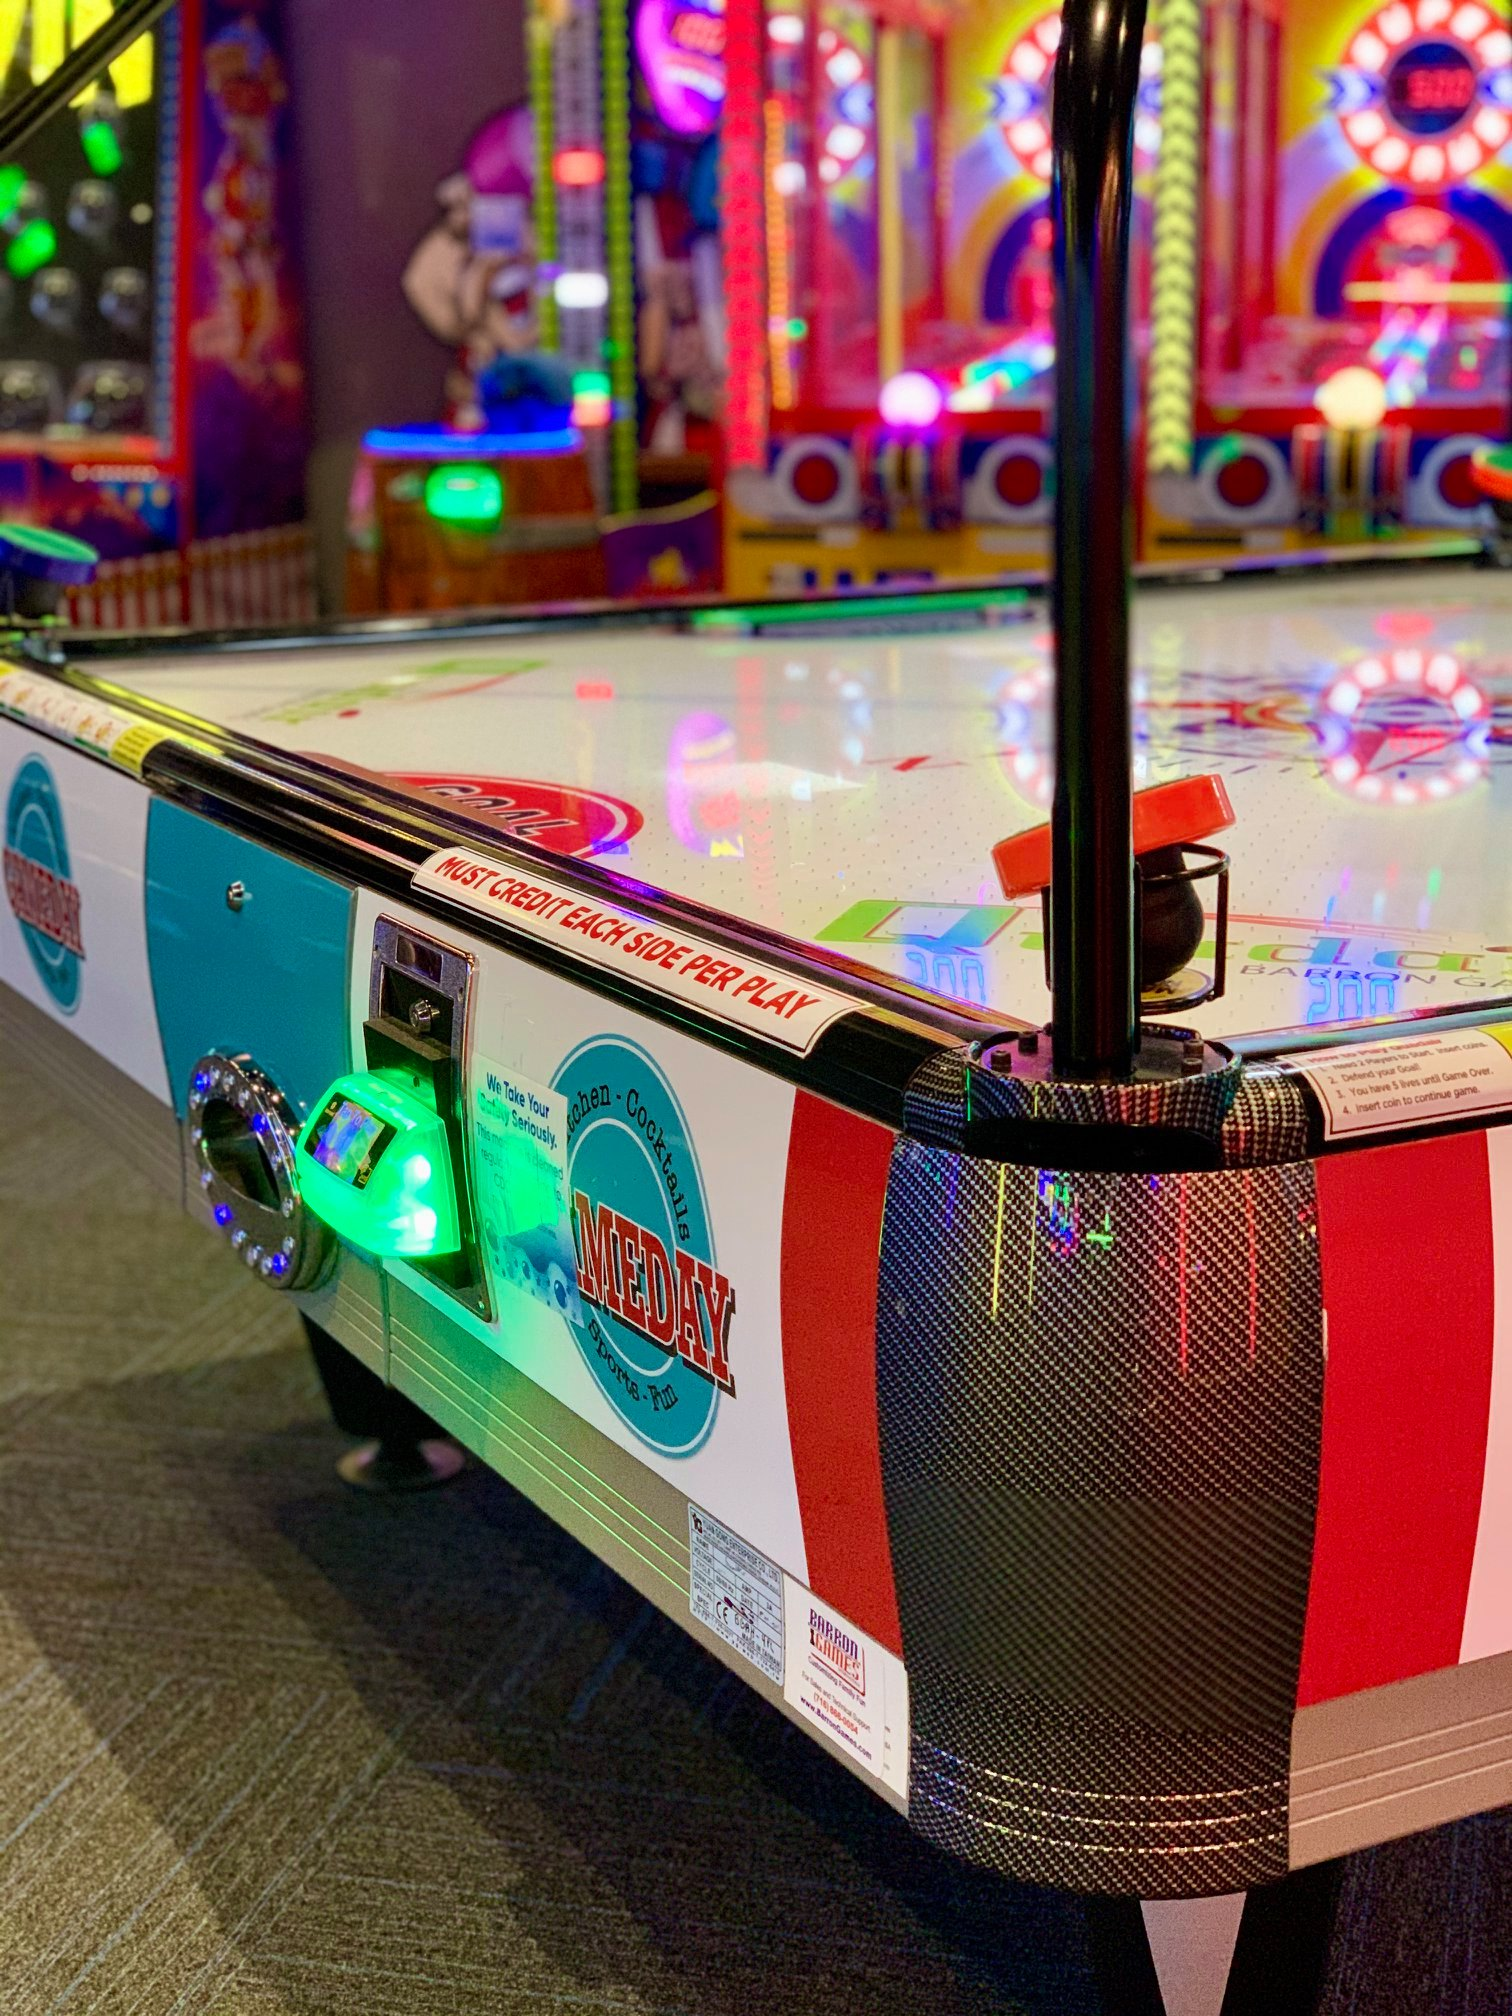 GameDay air hockey